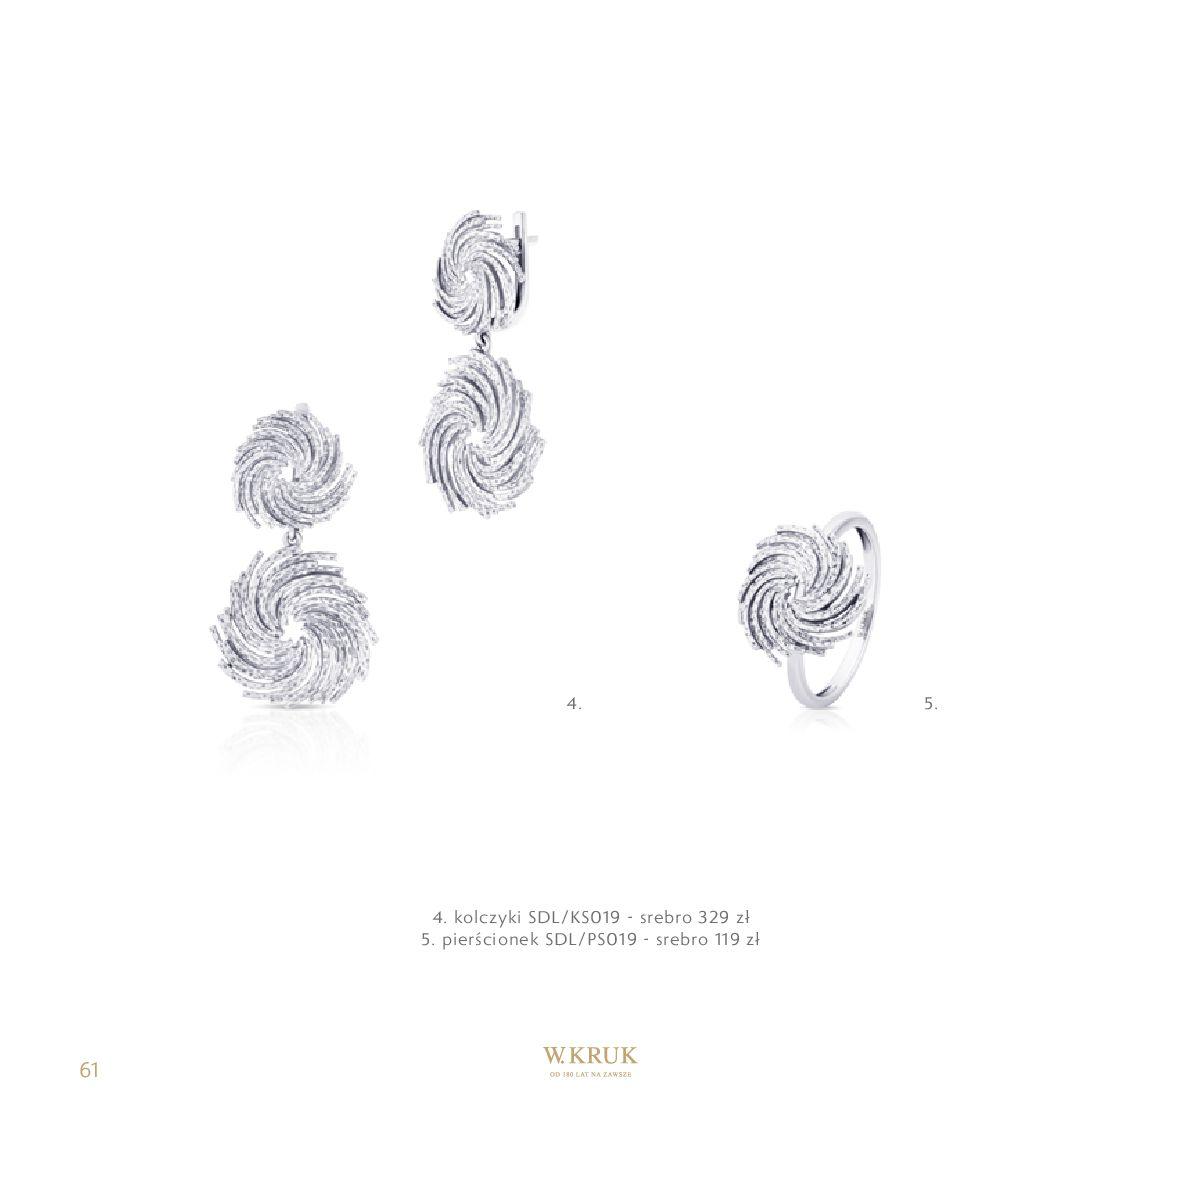 Gazetka W. KRUK: Katalog - Kolekcja Blask 2021-02-17 page-62